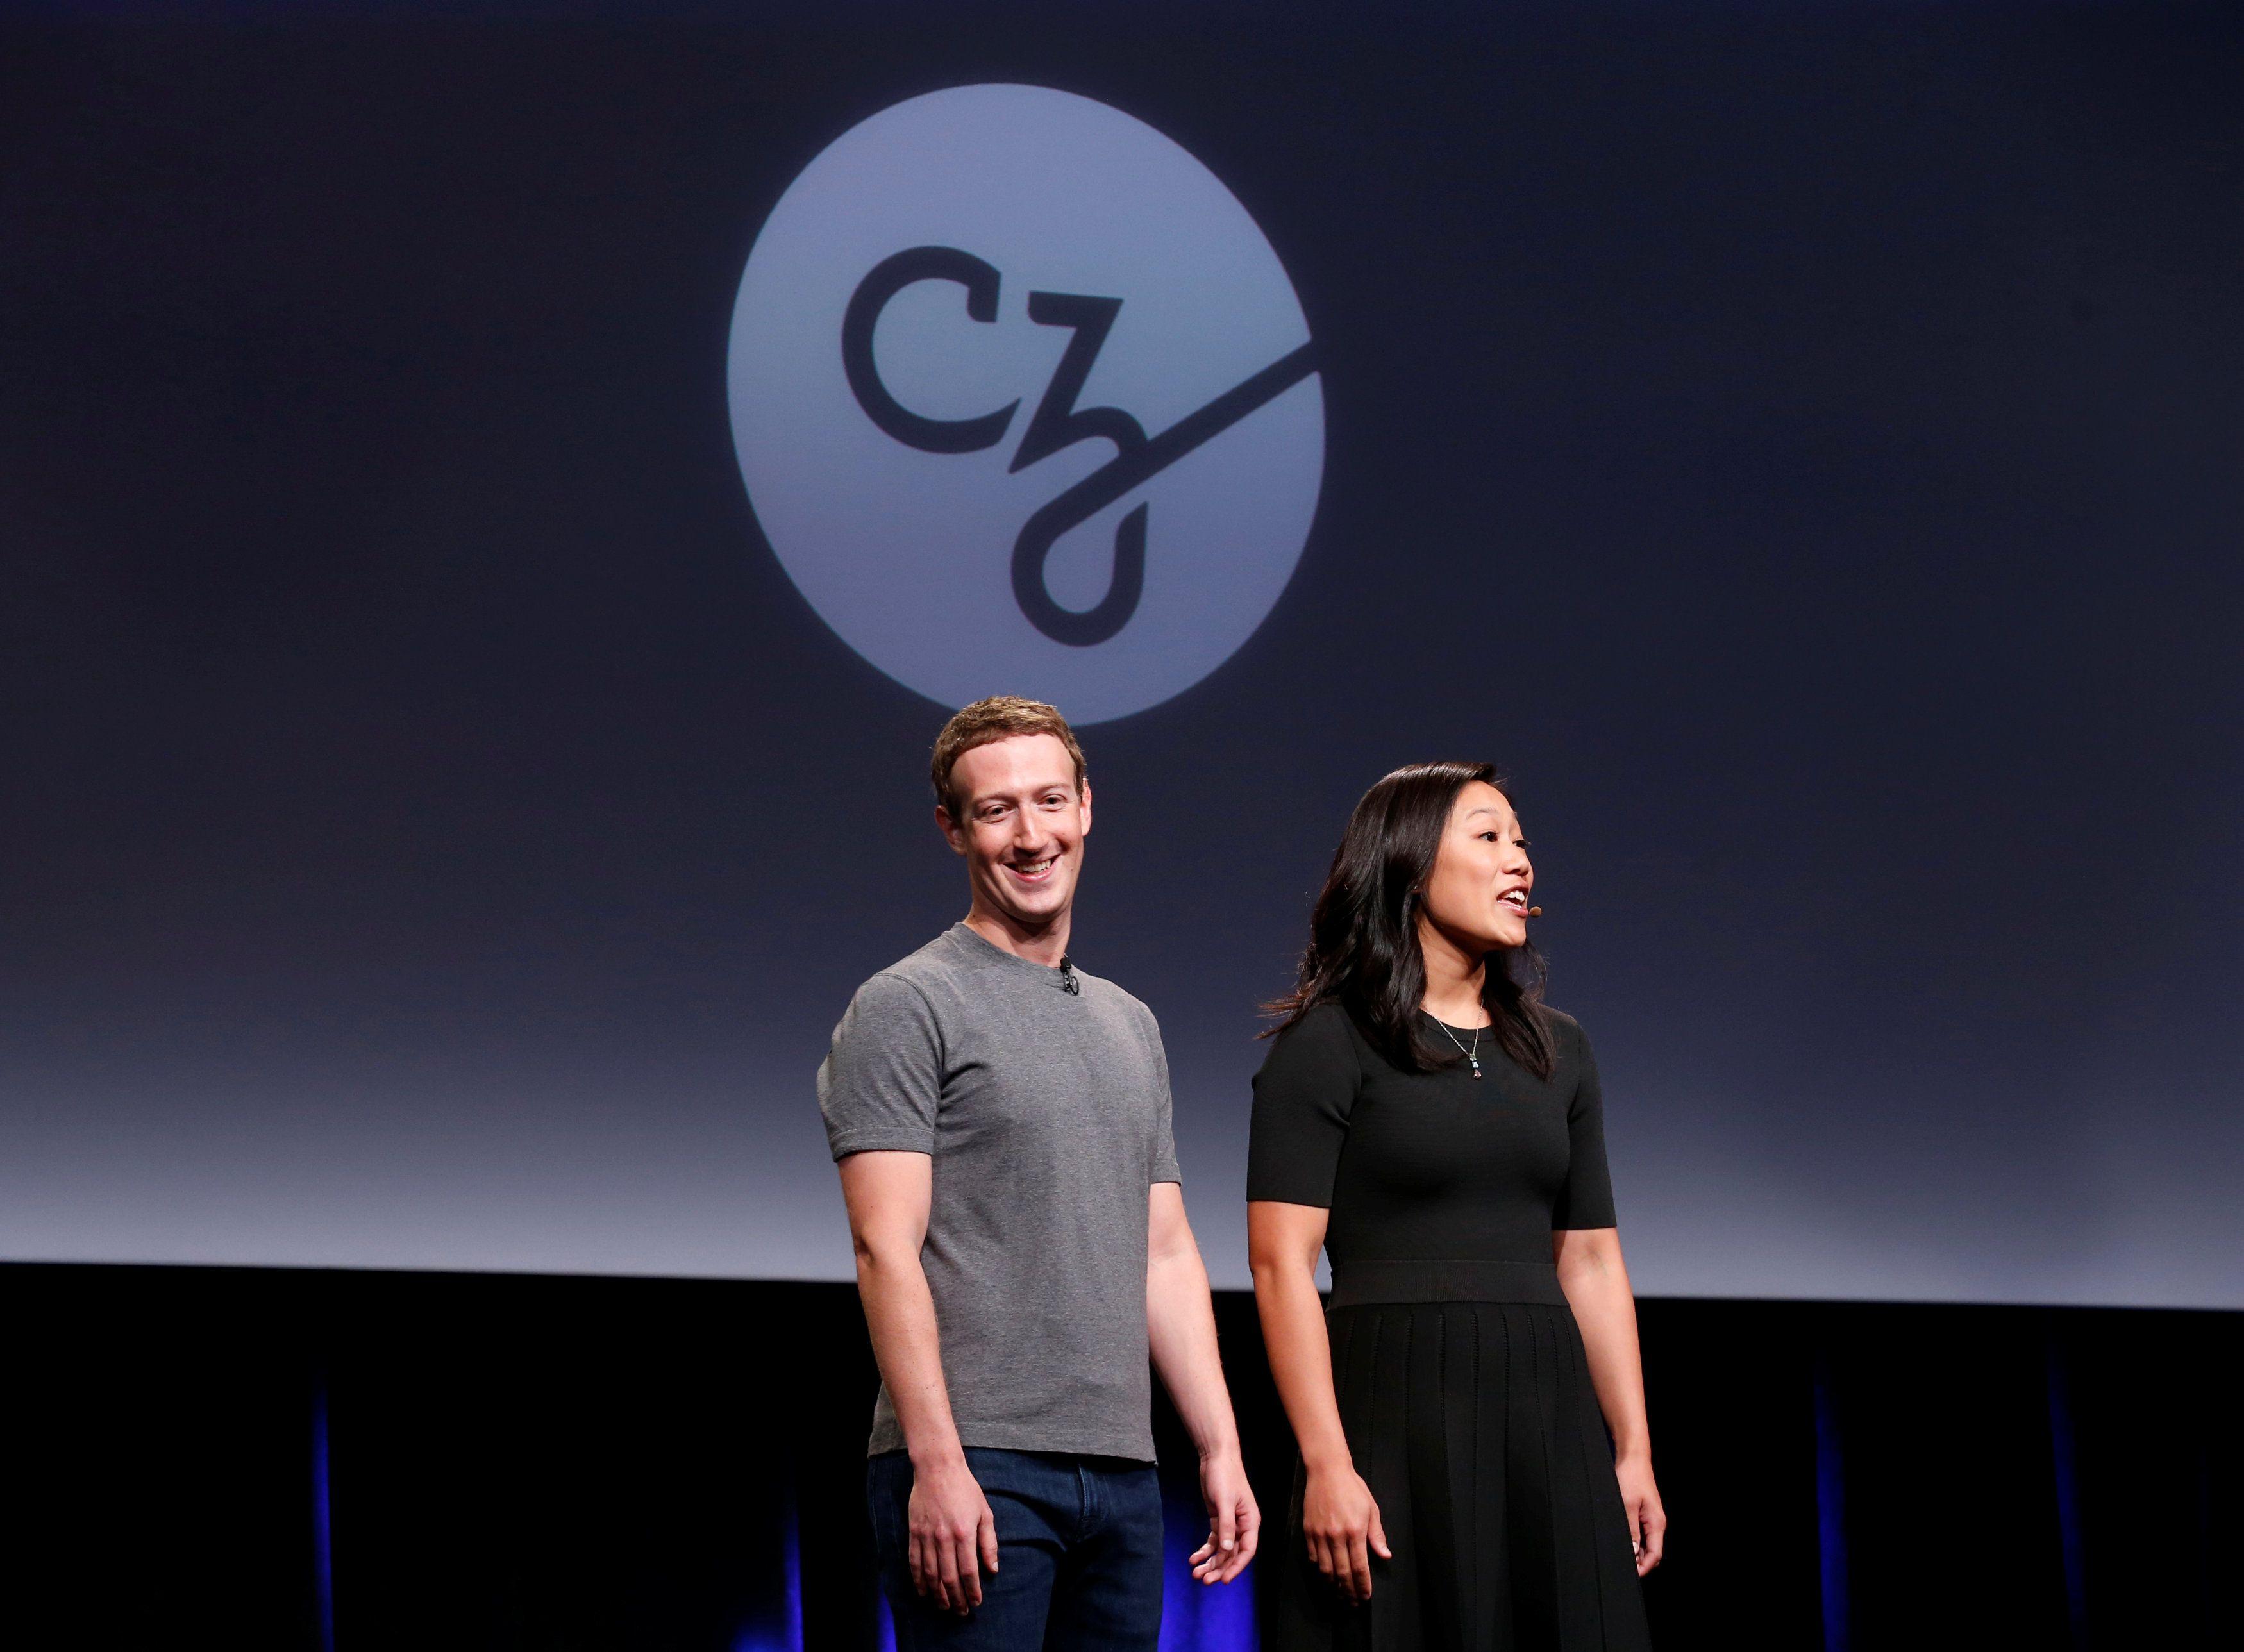 Марк Цукерберг та Прісцилла Чан